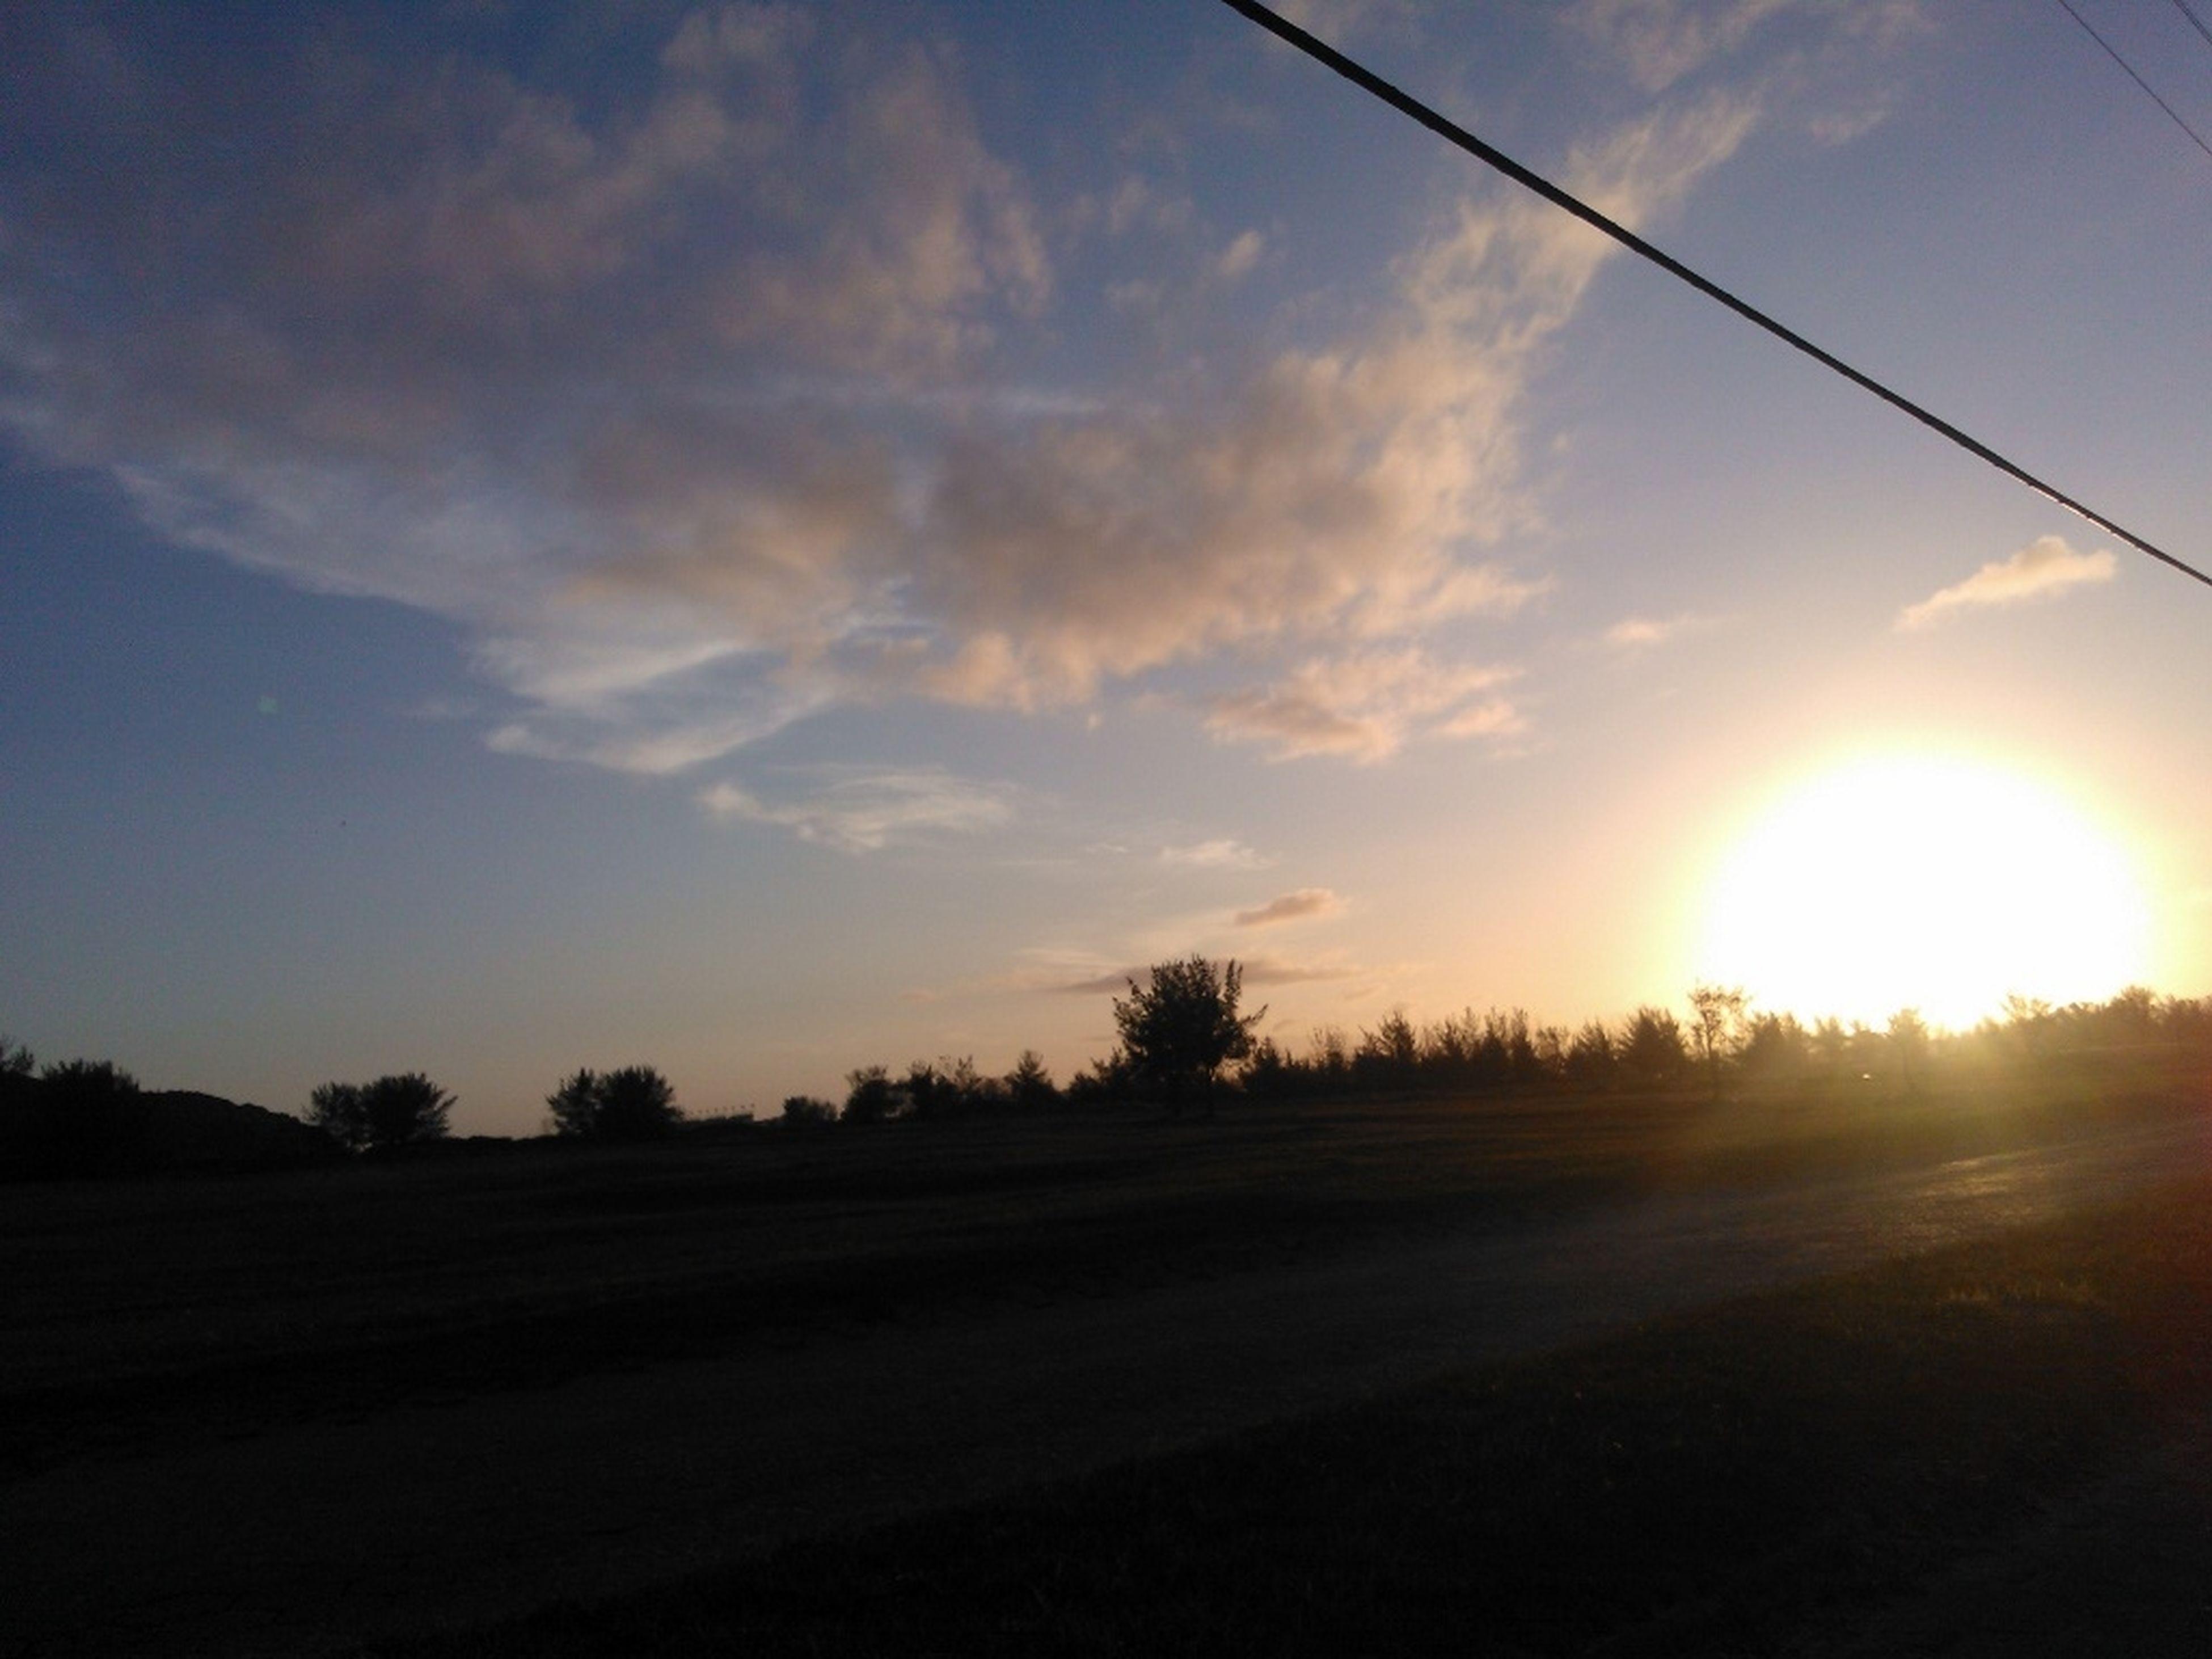 sunset, sun, sky, tranquility, tranquil scene, landscape, silhouette, scenics, beauty in nature, sunlight, nature, sunbeam, orange color, cloud - sky, field, tree, lens flare, idyllic, road, cloud